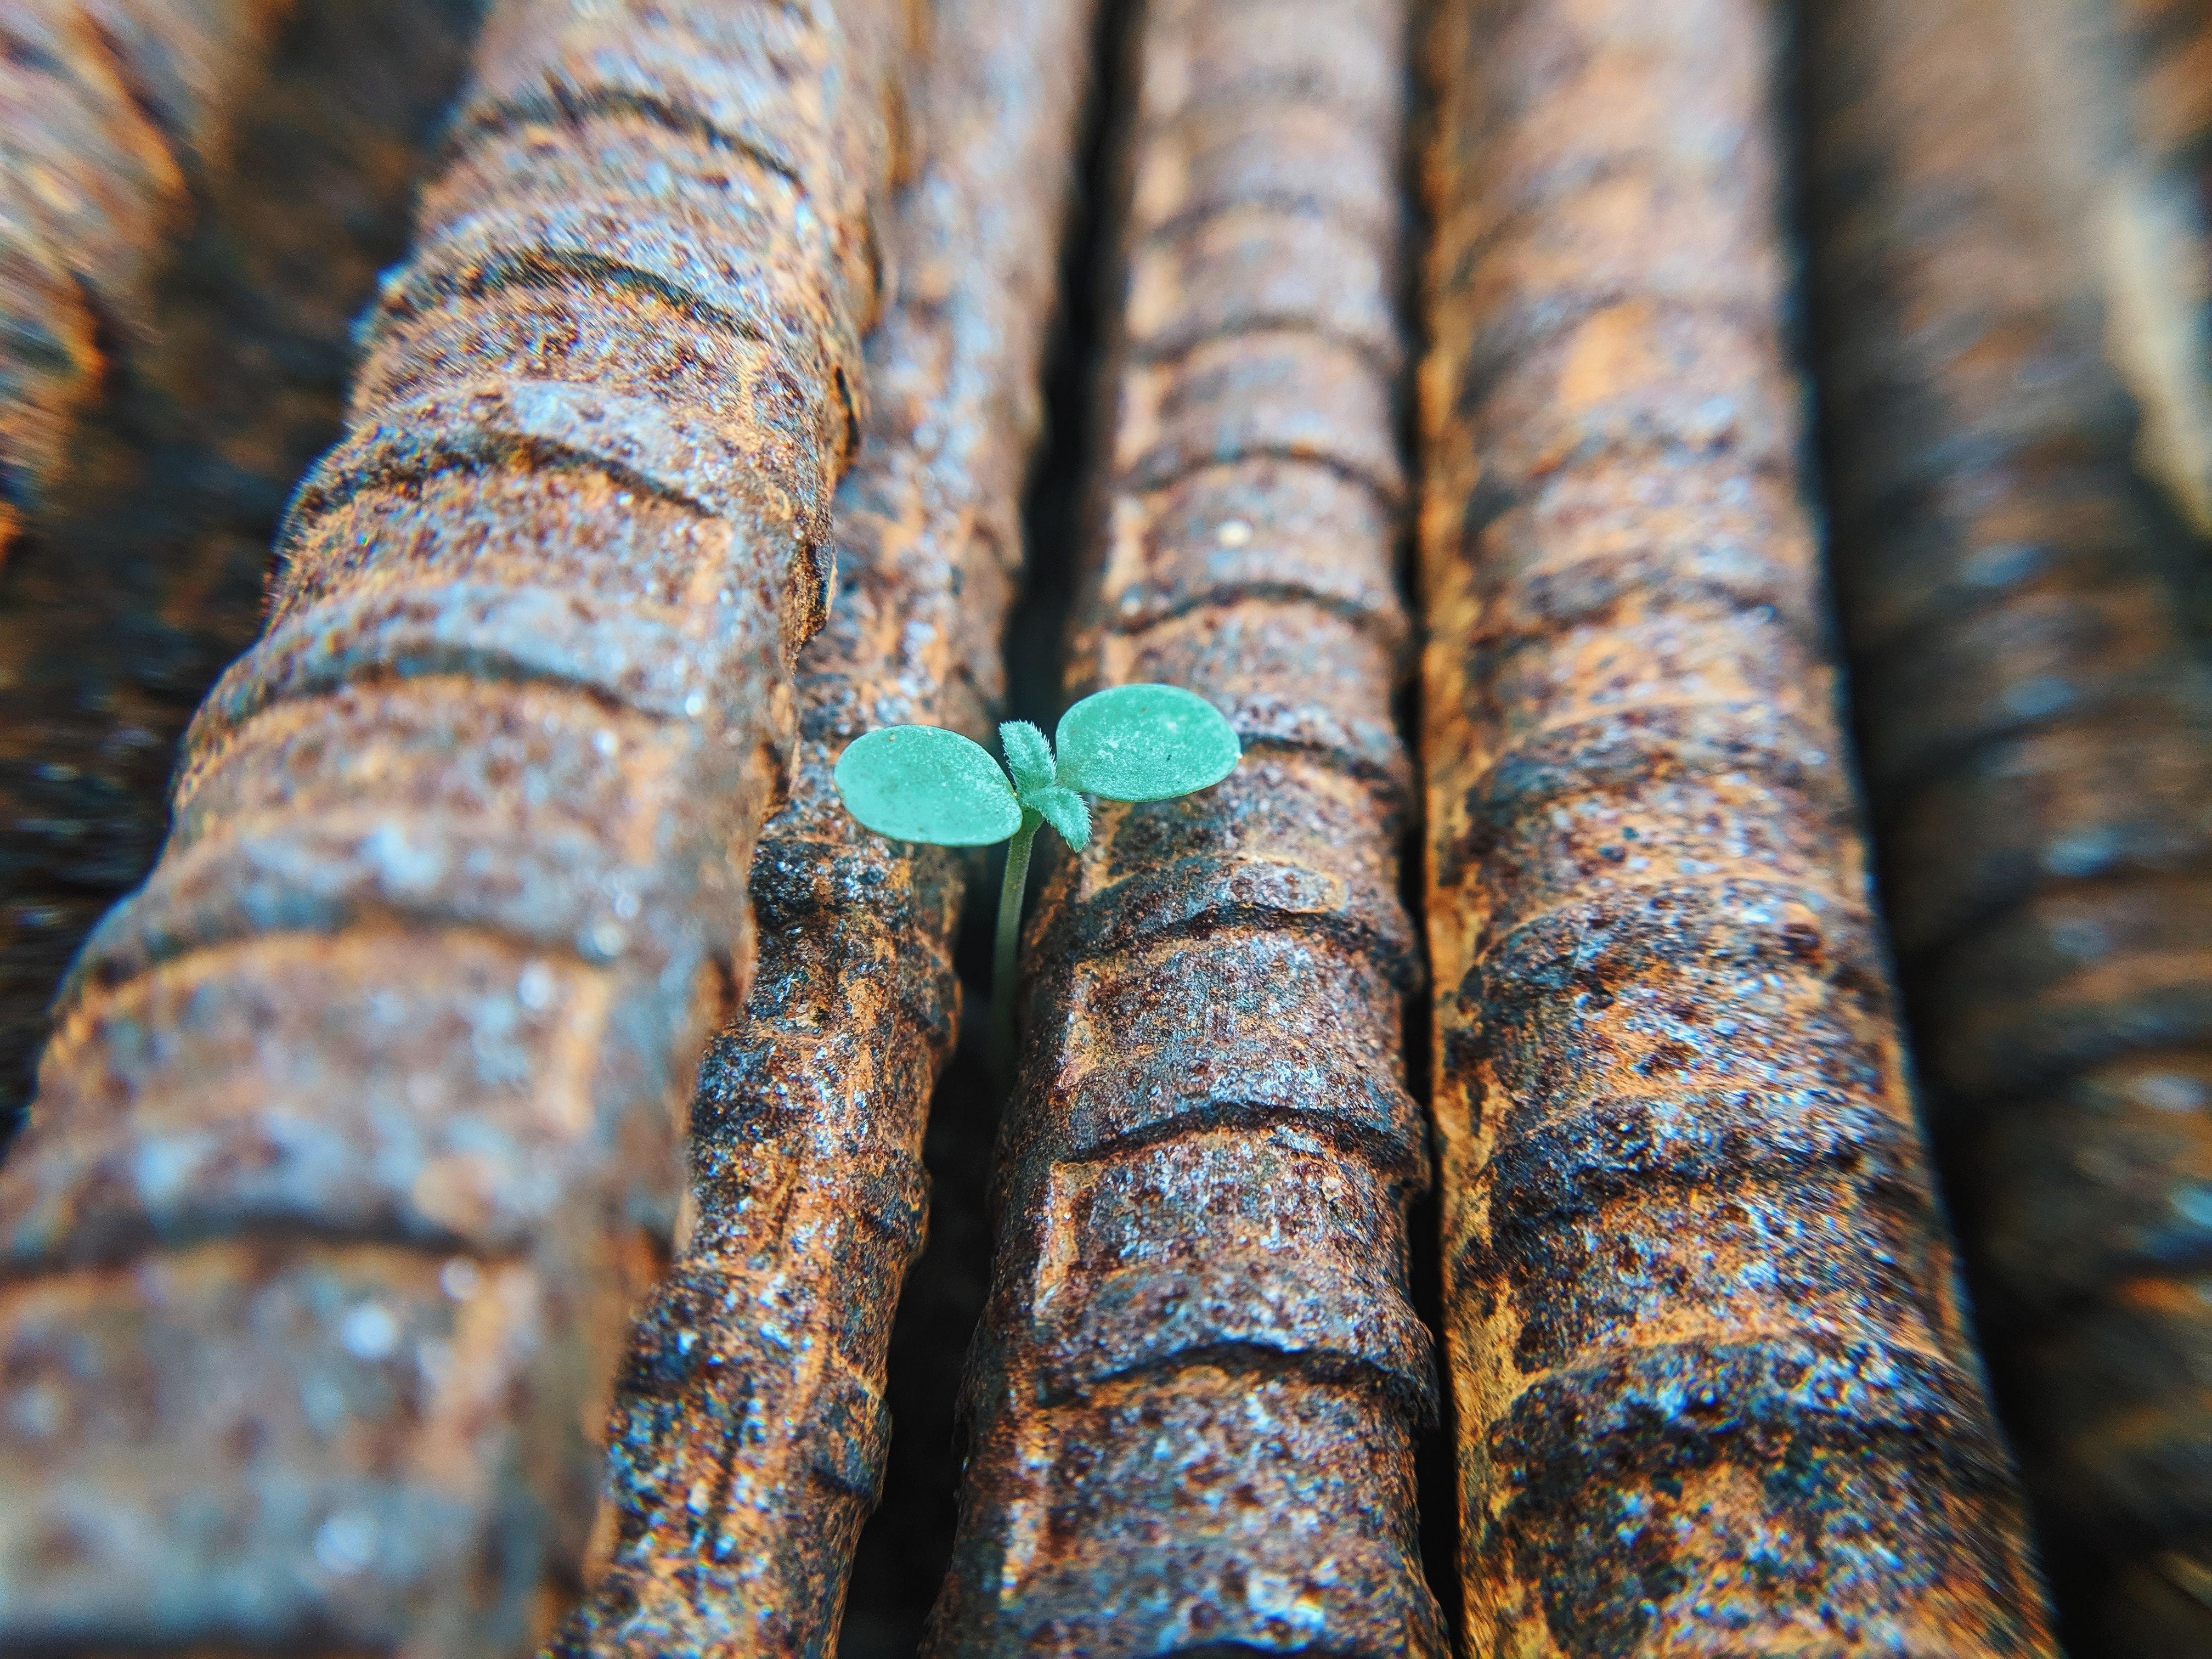 seedling-in-irons-unsplash